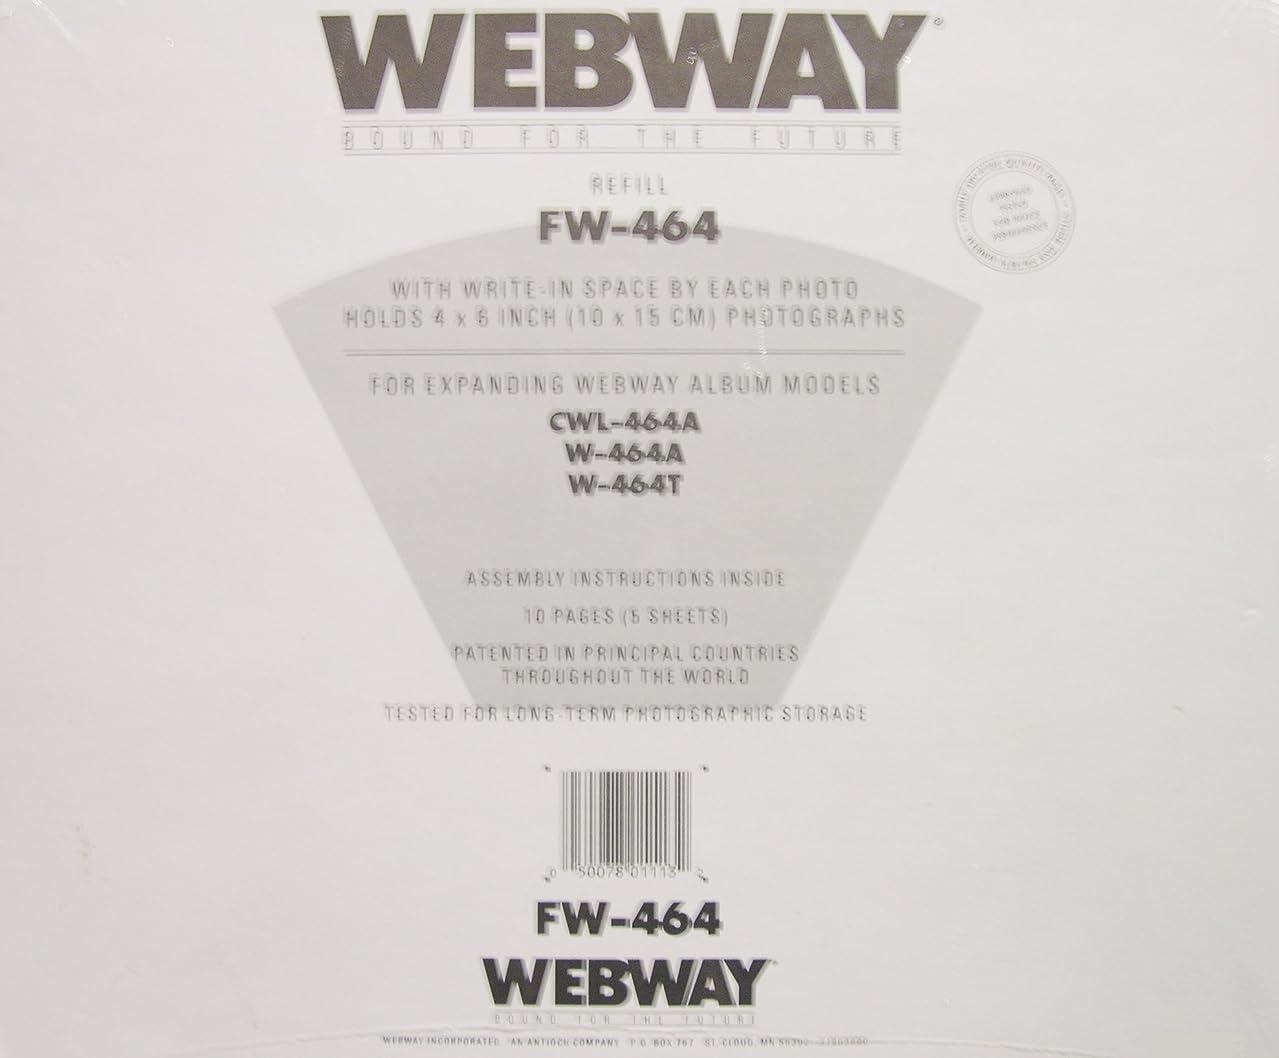 WEBWAY Refill FW-464